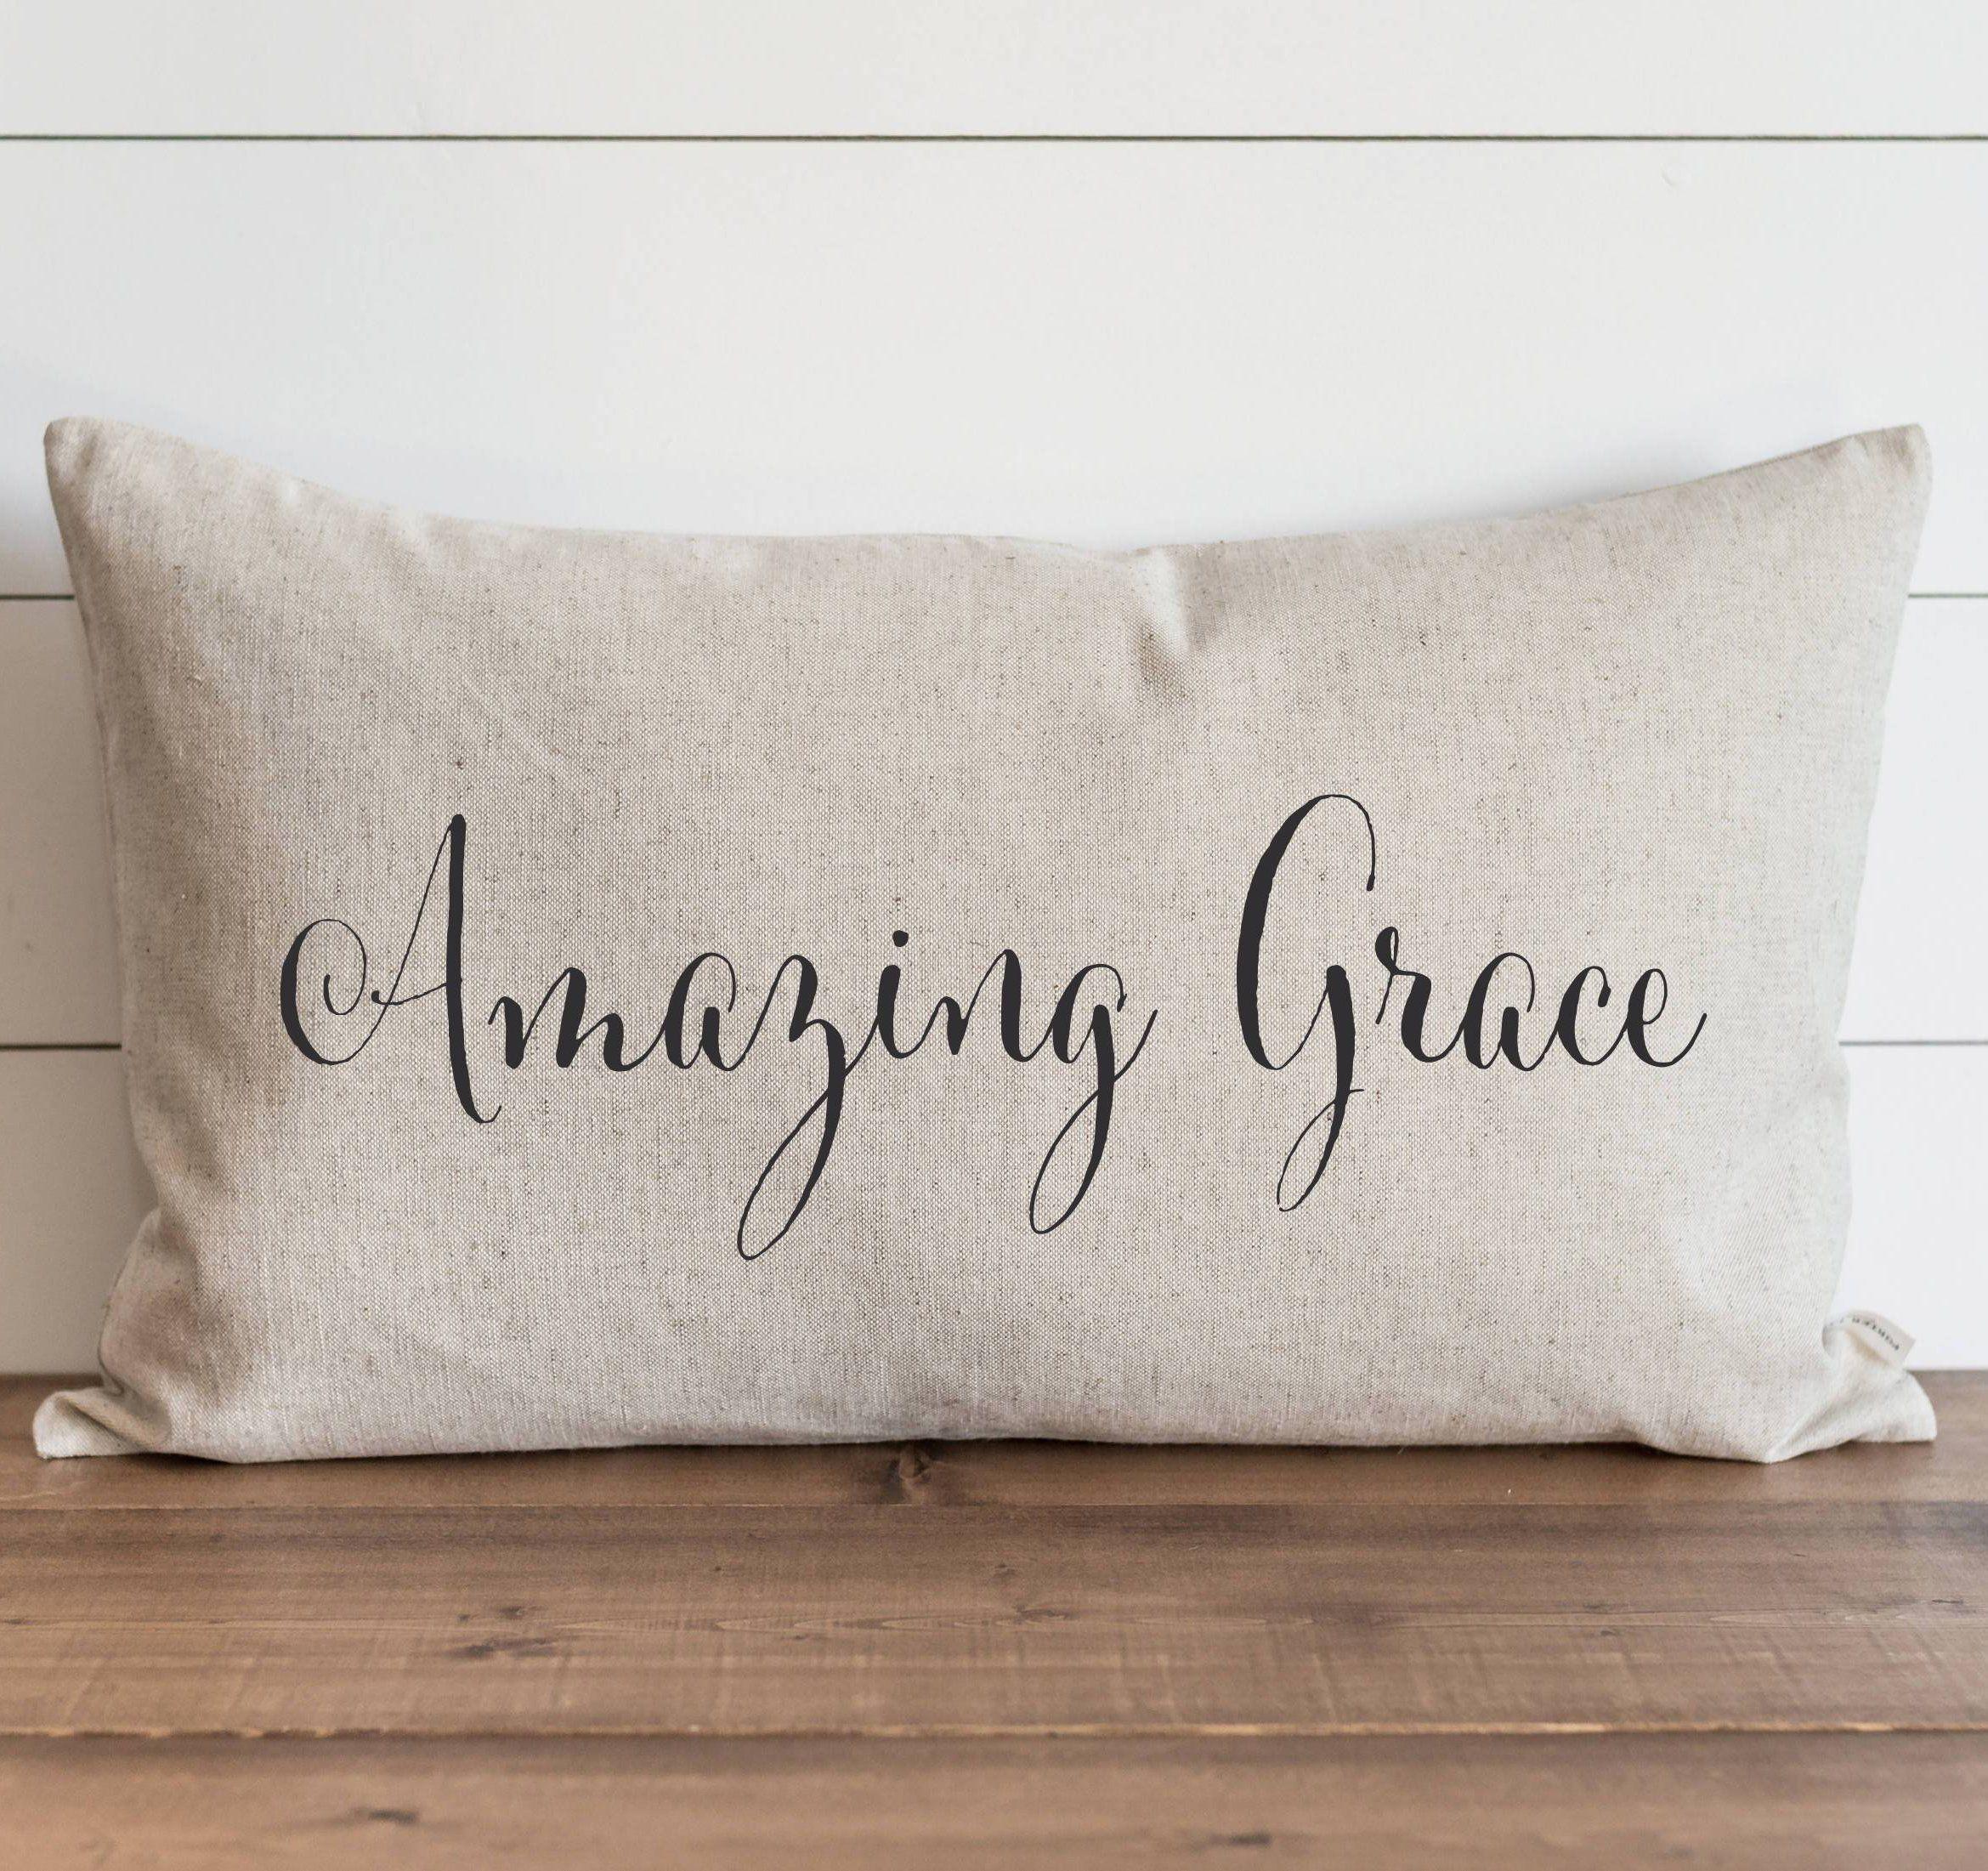 Amazing Grace Pillow Cover.